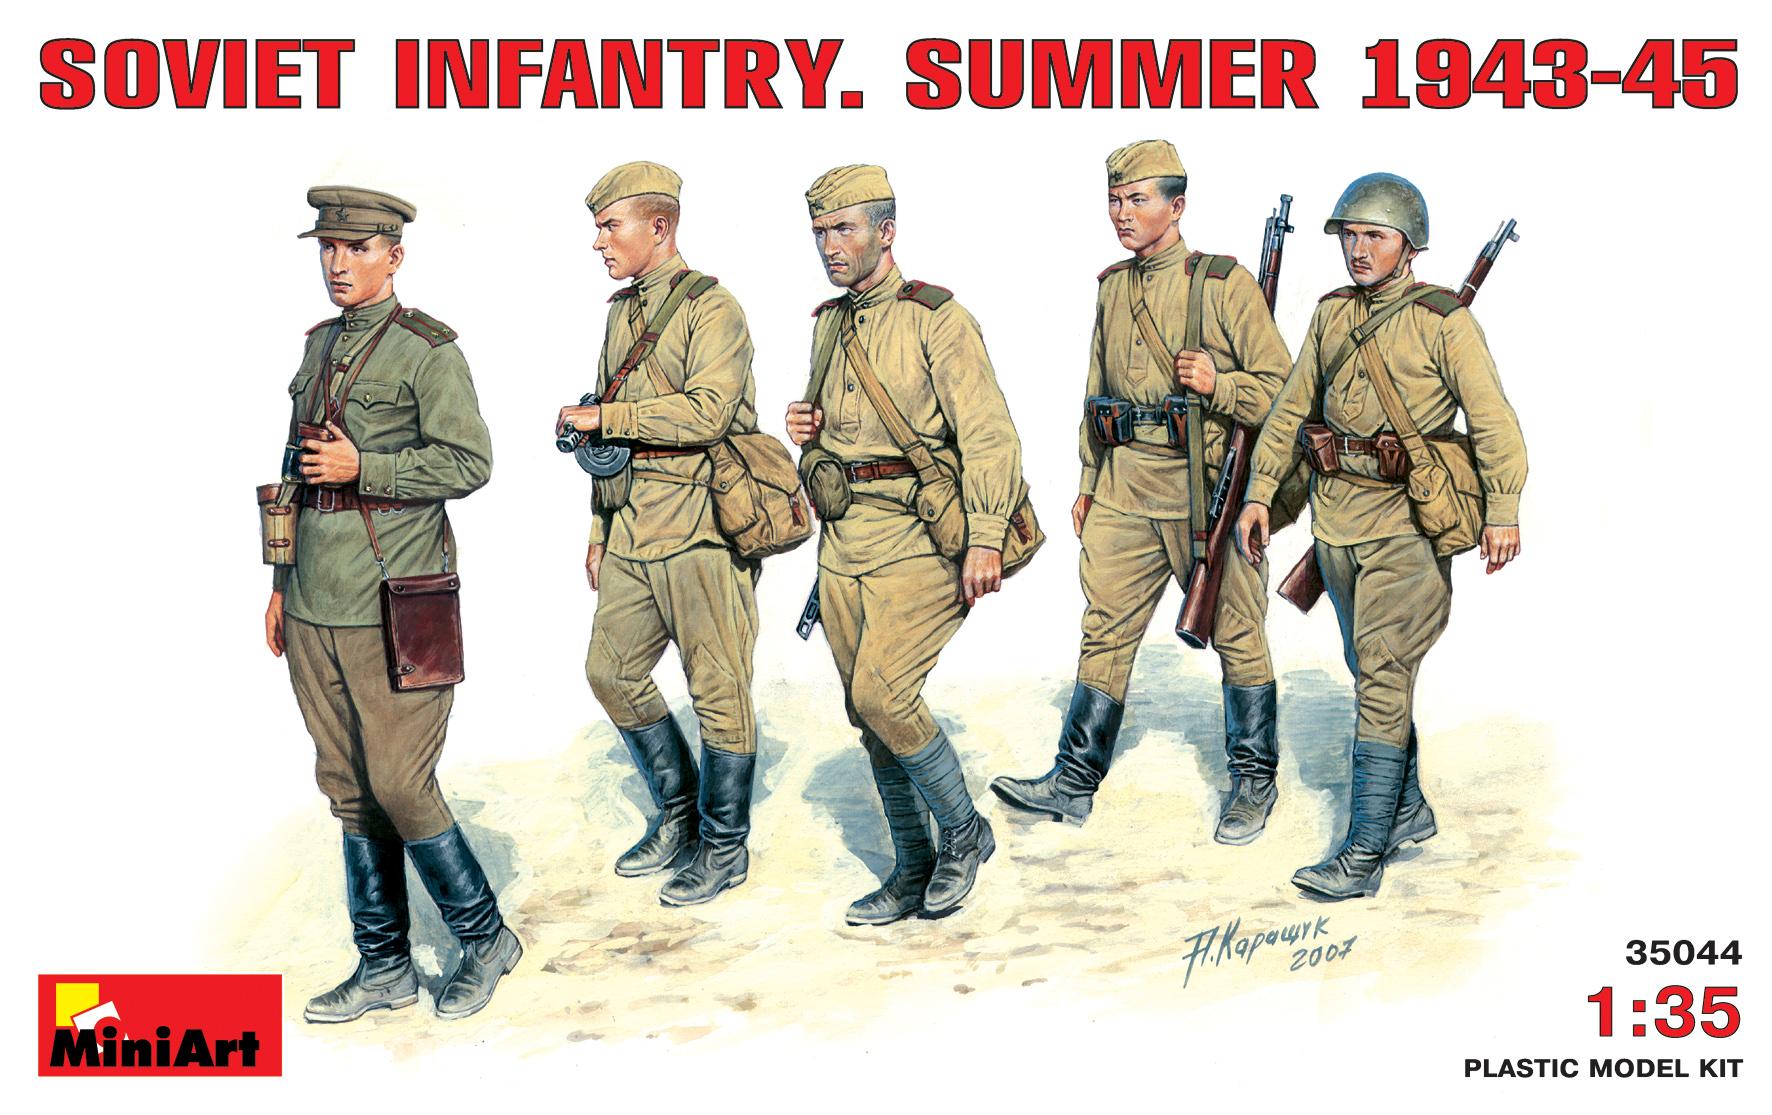 35044 SOVIET INFANTRY. SUMMER 1943-45